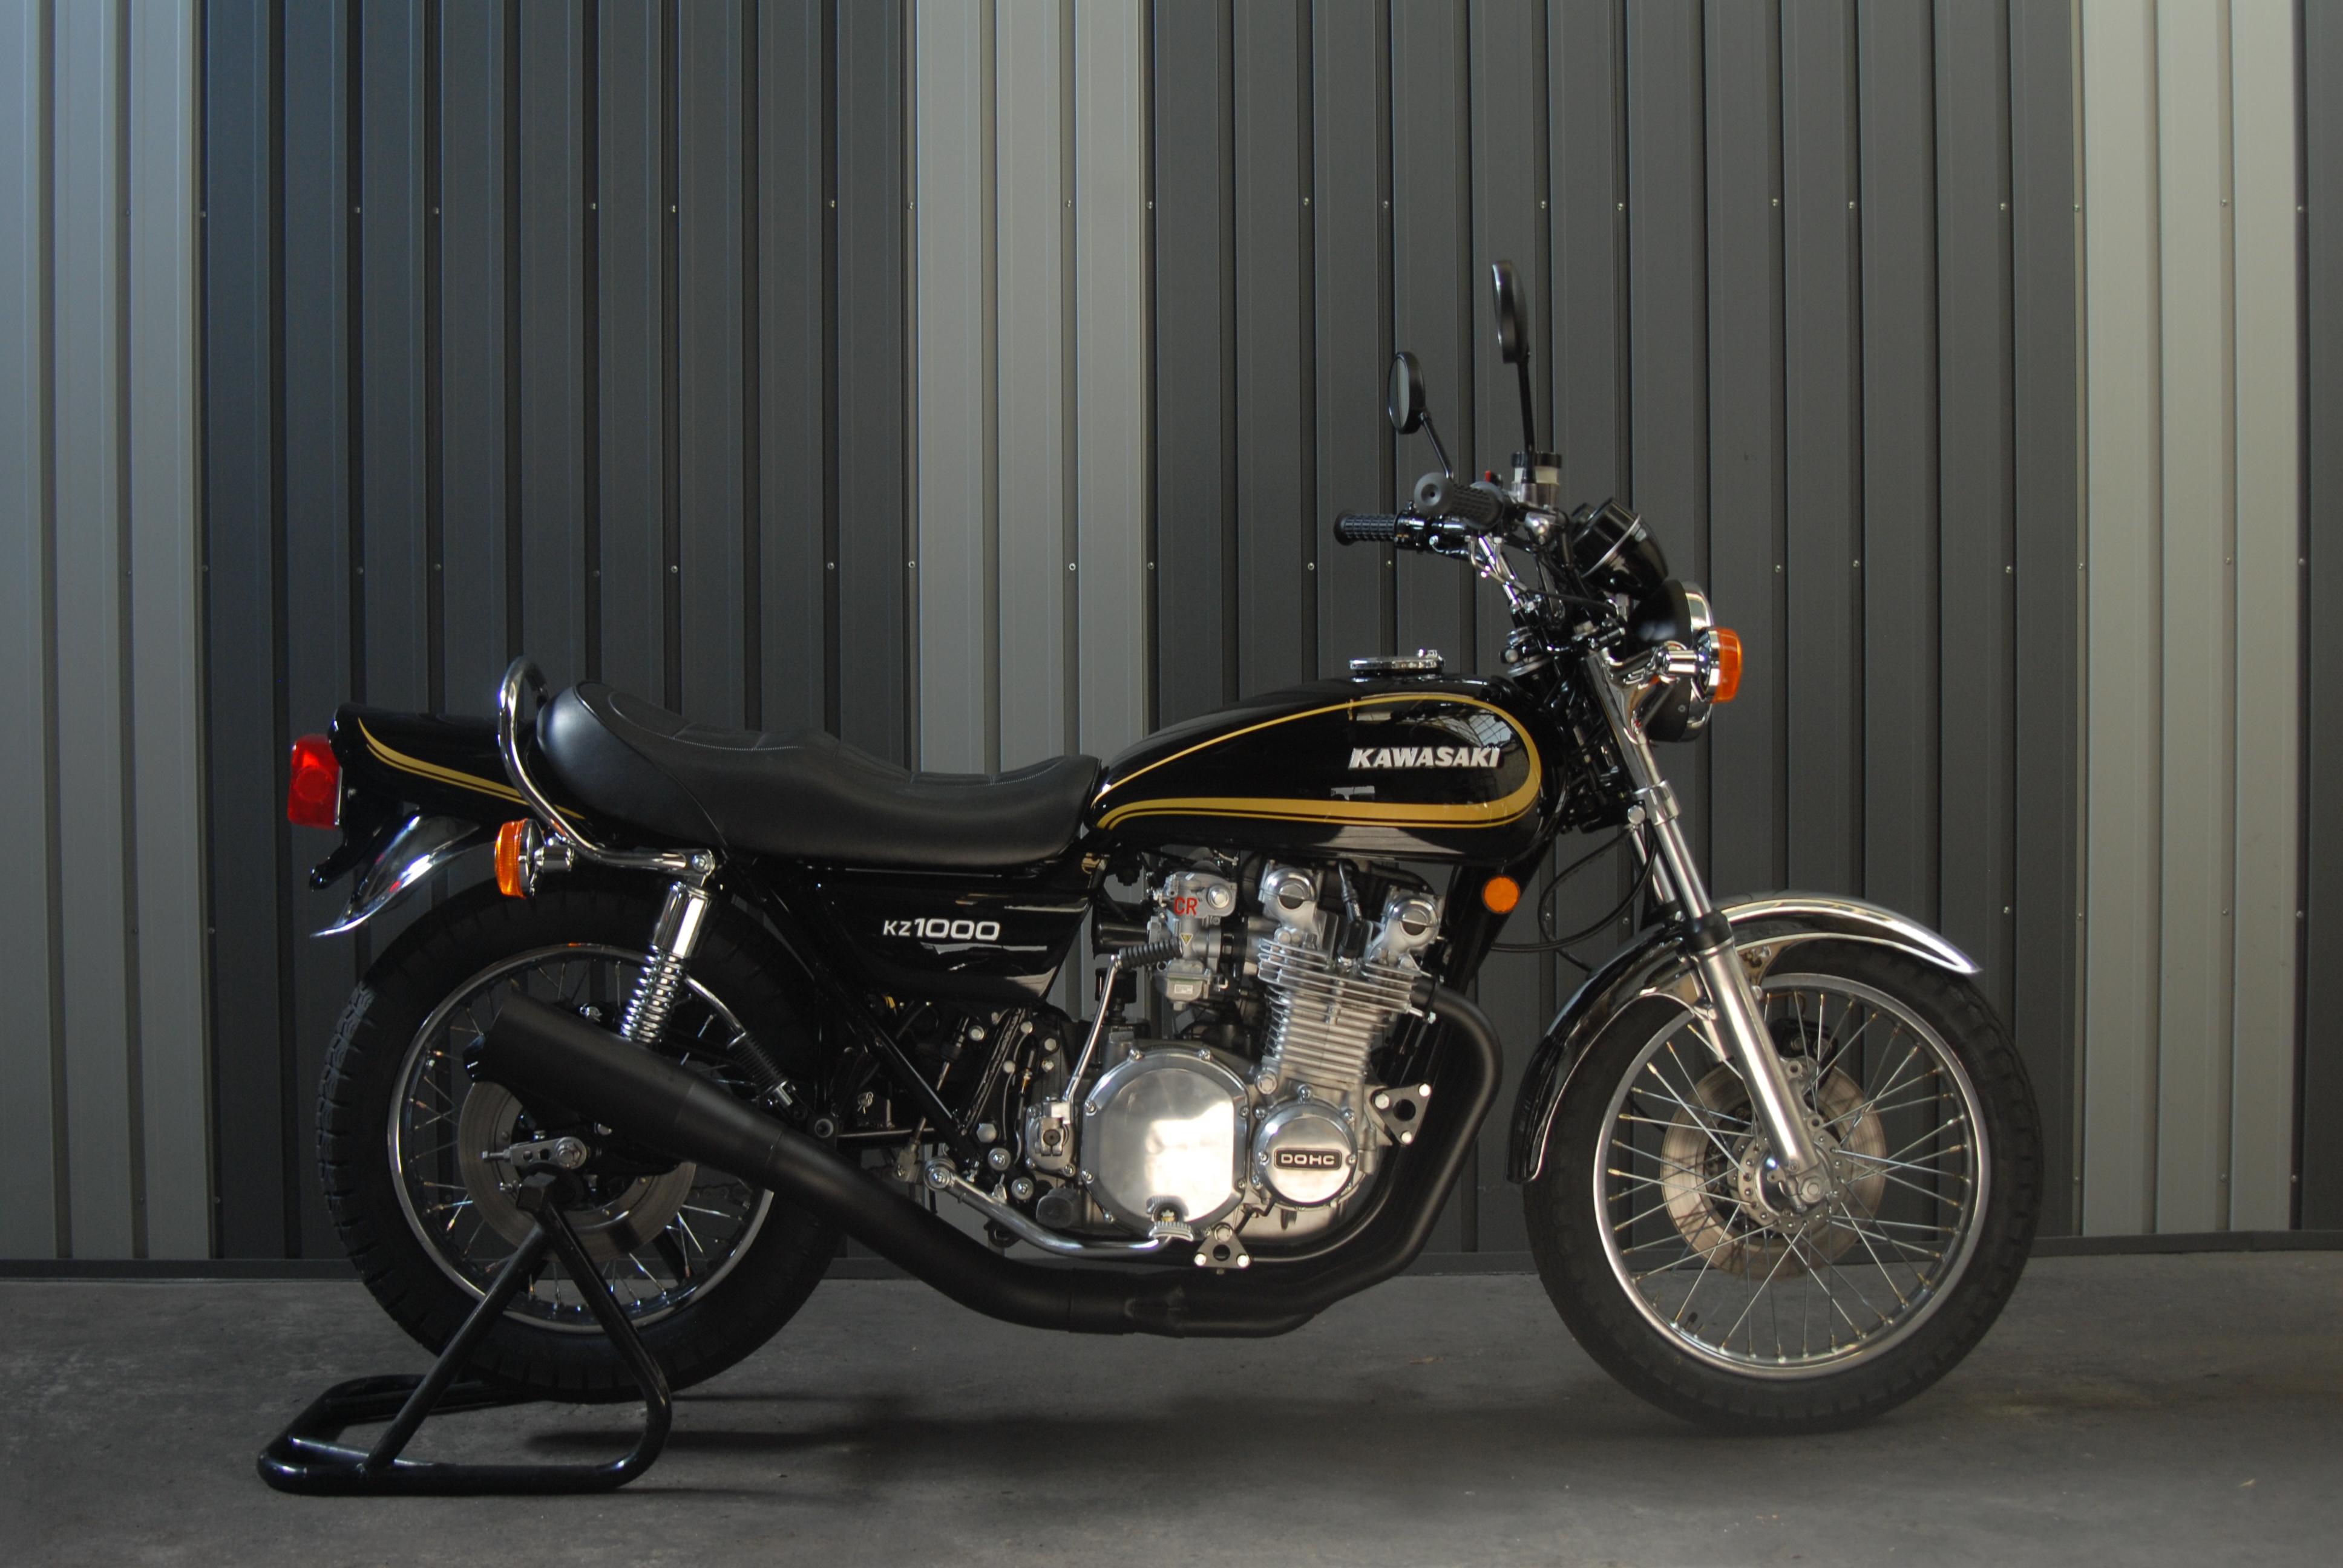 New KZ1000 Lincoln Black